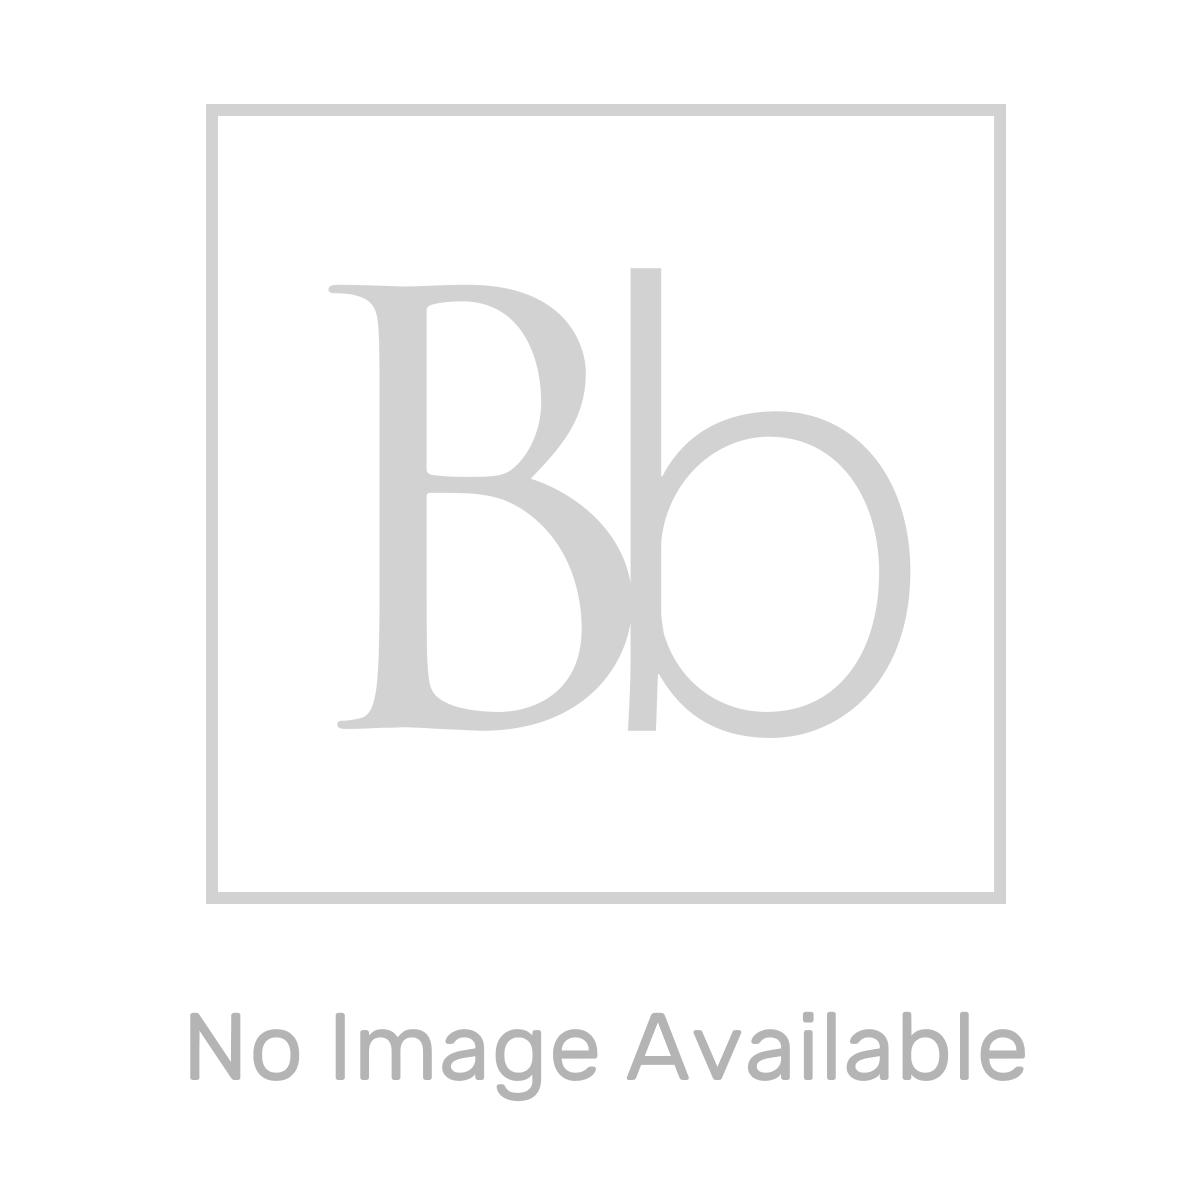 Salamander RP50TU 1.5 Bar Twin Universal Bathroom Pump Back